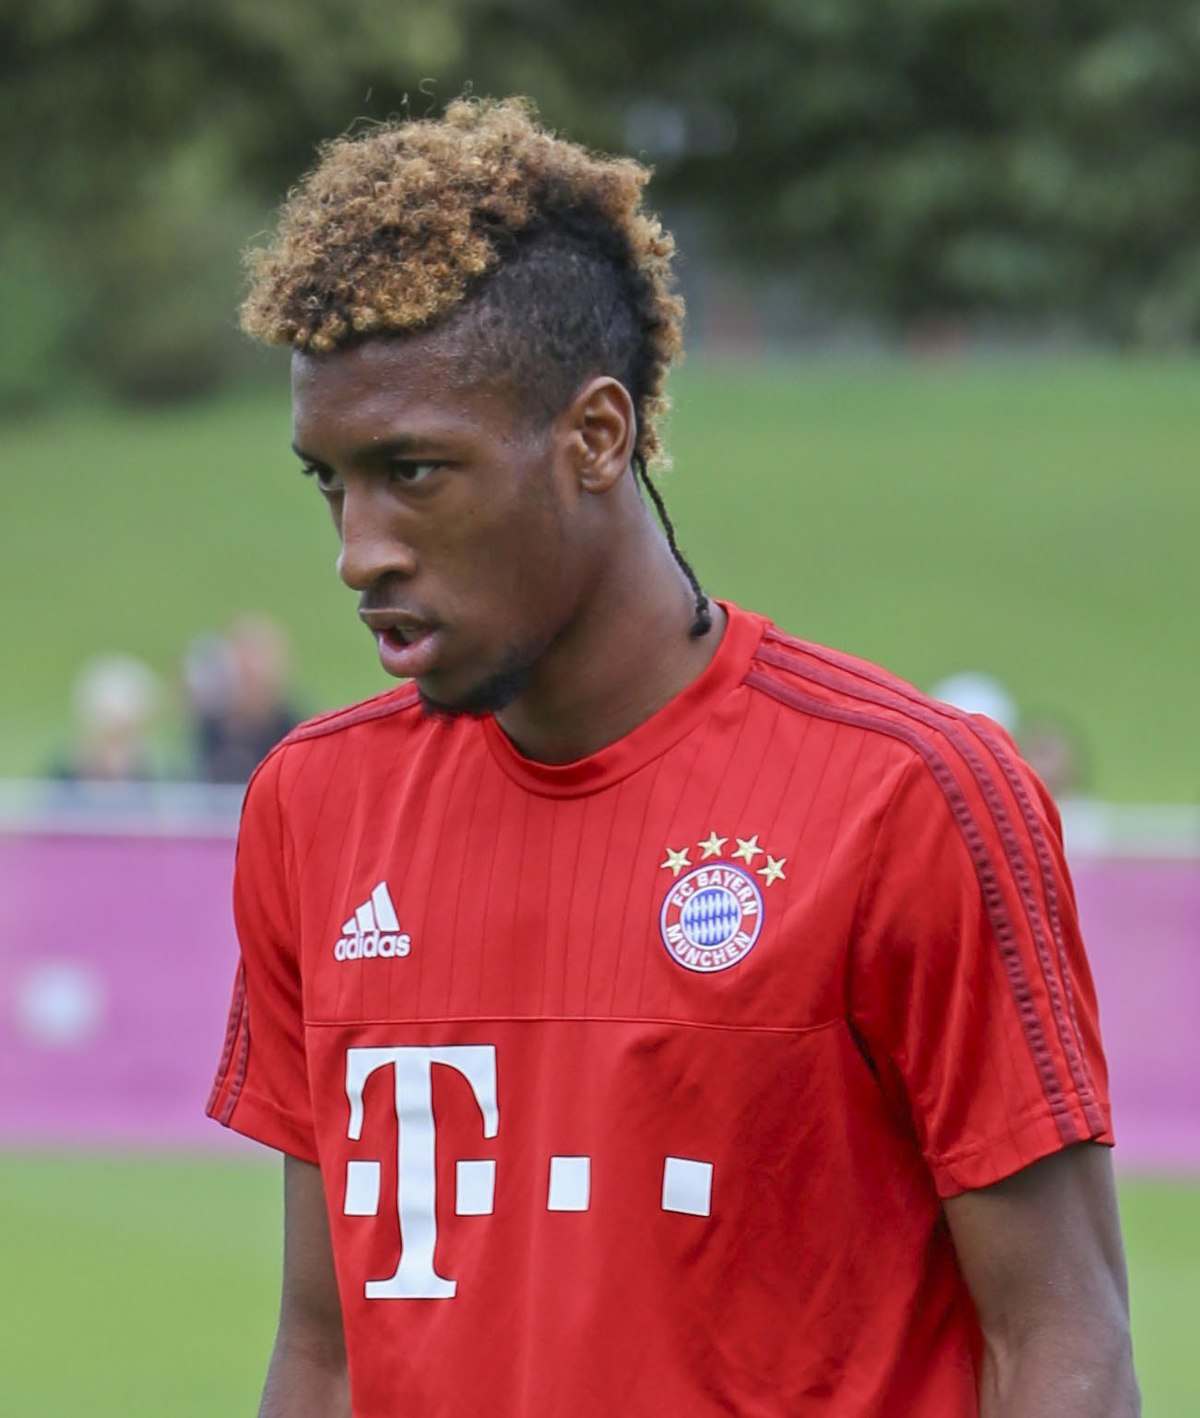 Kingsley Coman Training FC Bayern München-1 (cropped)-2.jpg